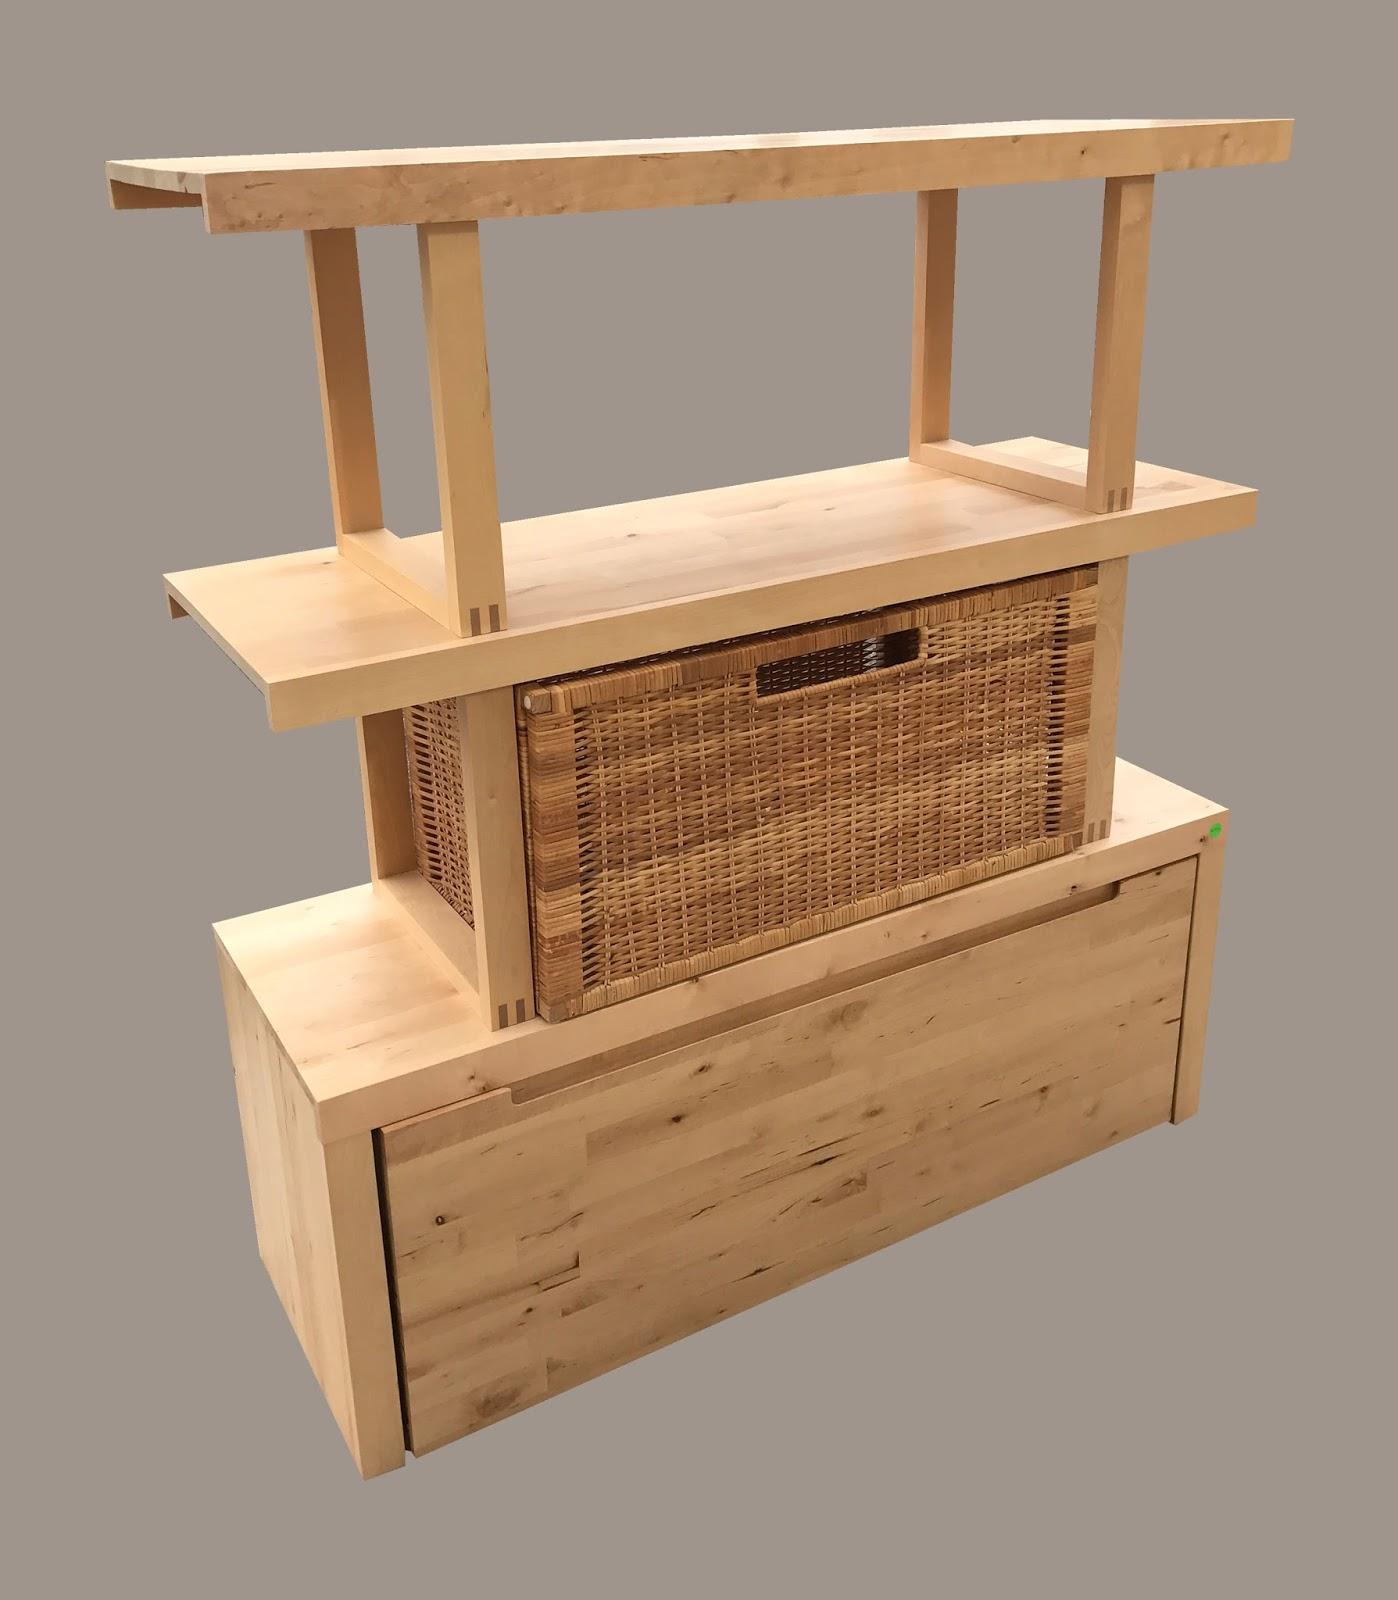 uhuru furniture collectibles shelf unit with bottom. Black Bedroom Furniture Sets. Home Design Ideas